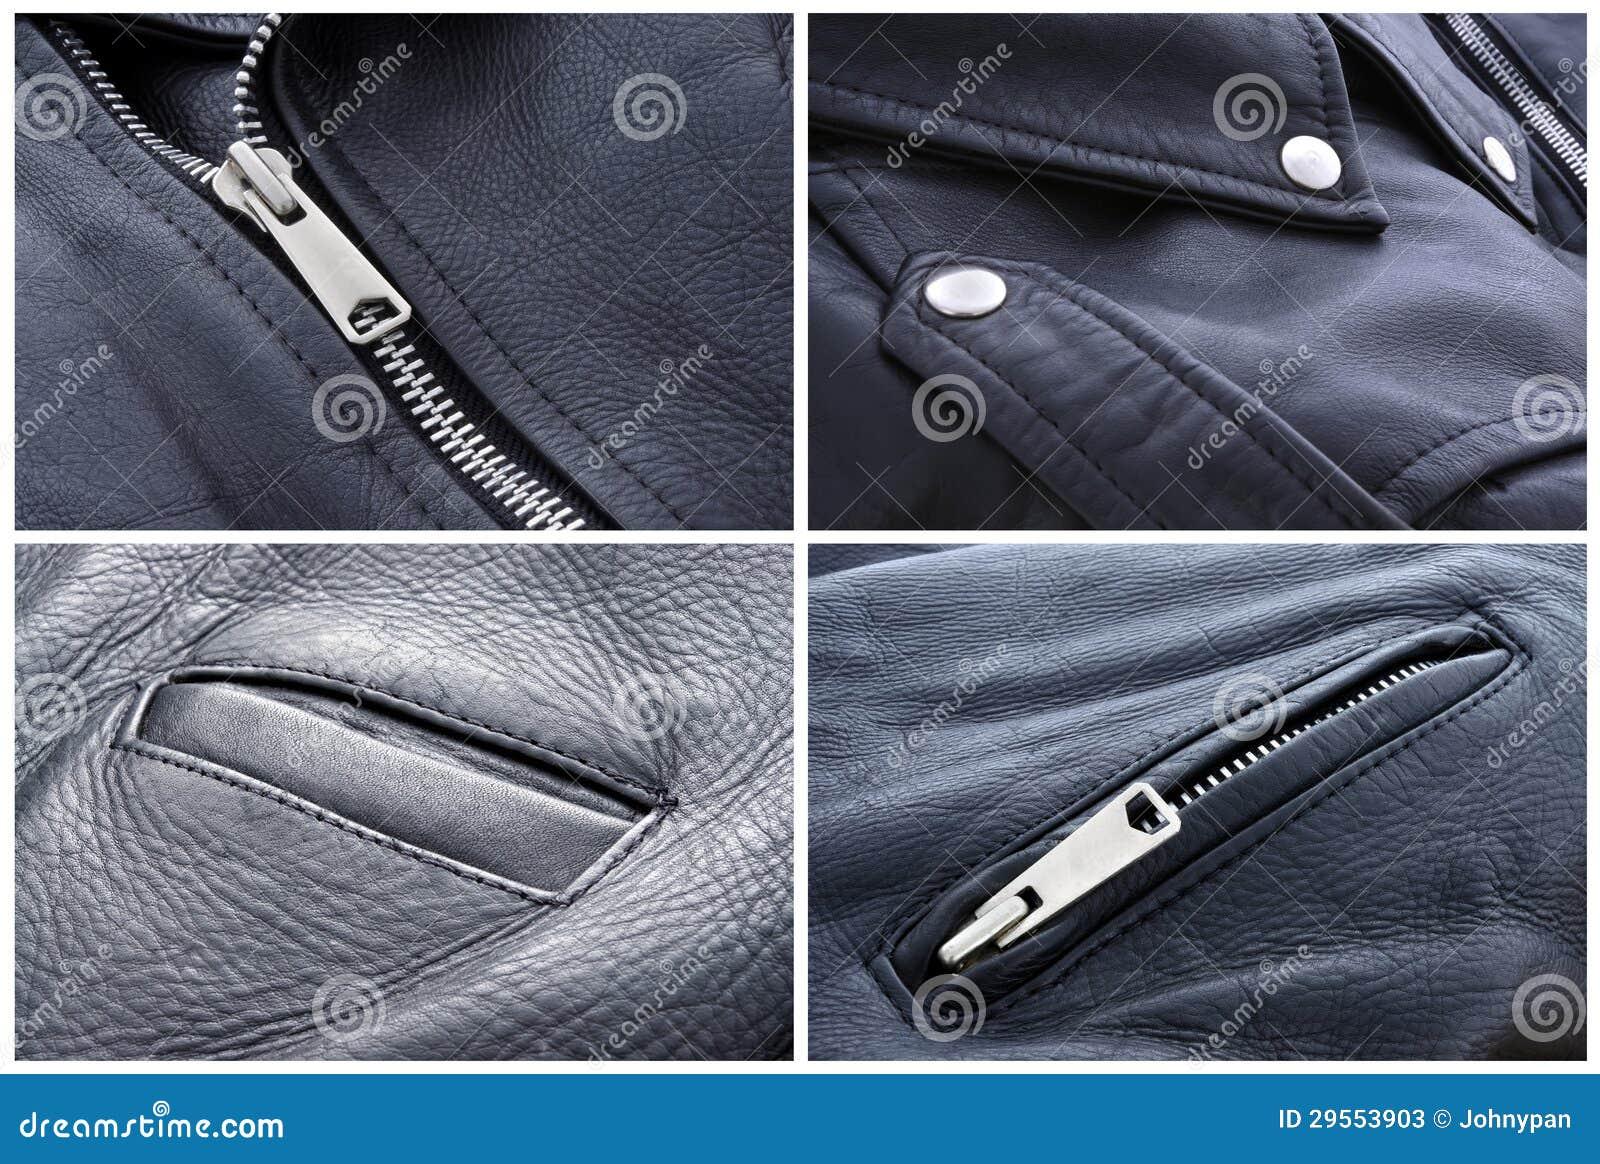 Leather Jacket Texture Stock Photos - Image: 29553903